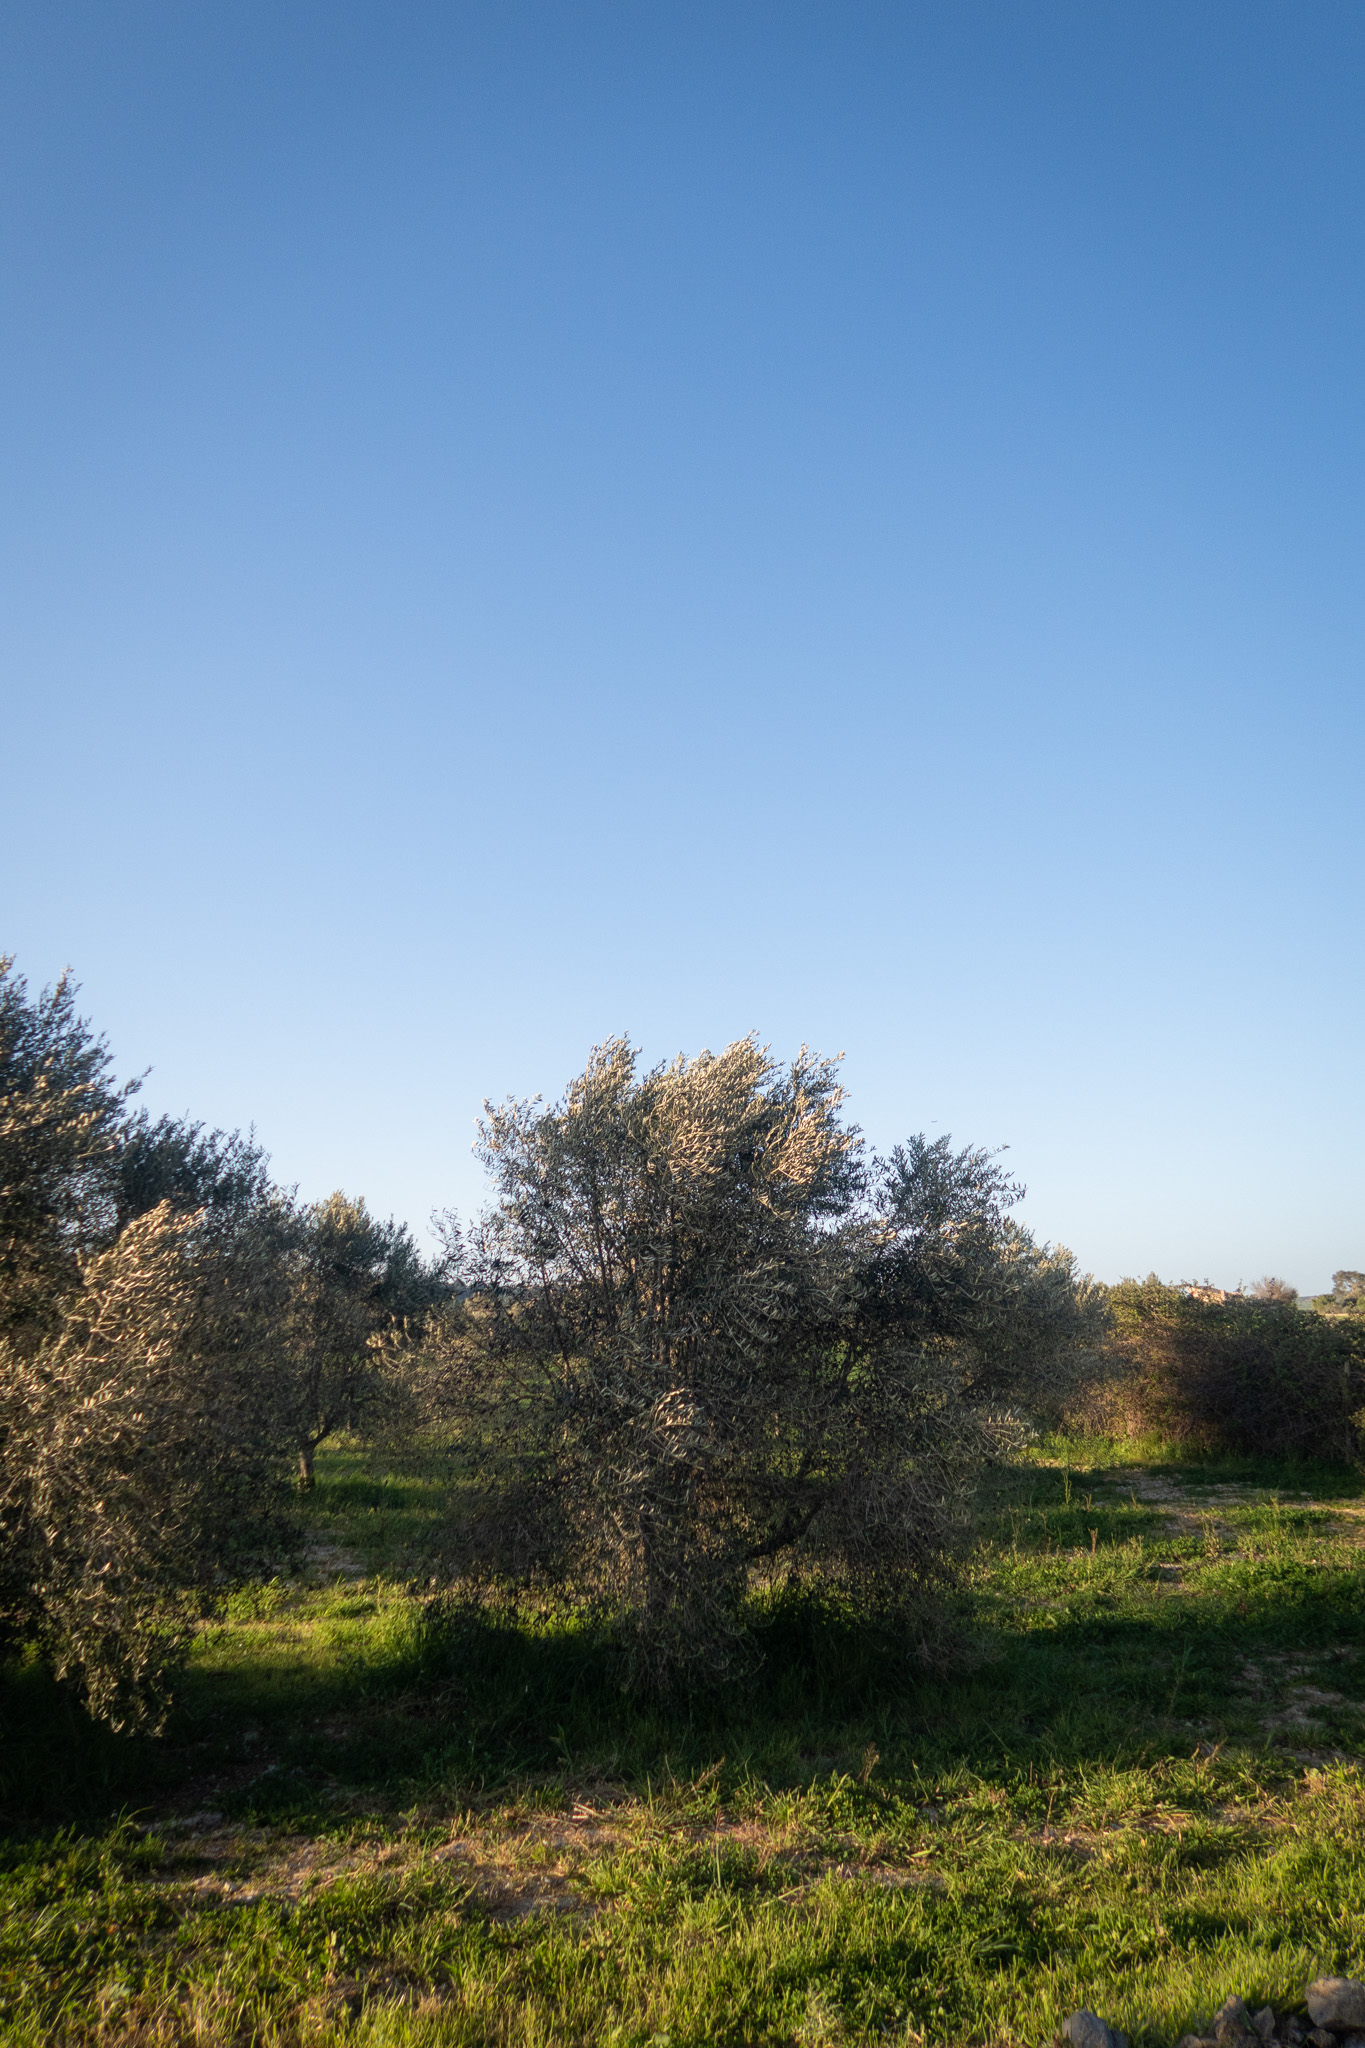 ida-carr-blogg-2-2.jpg